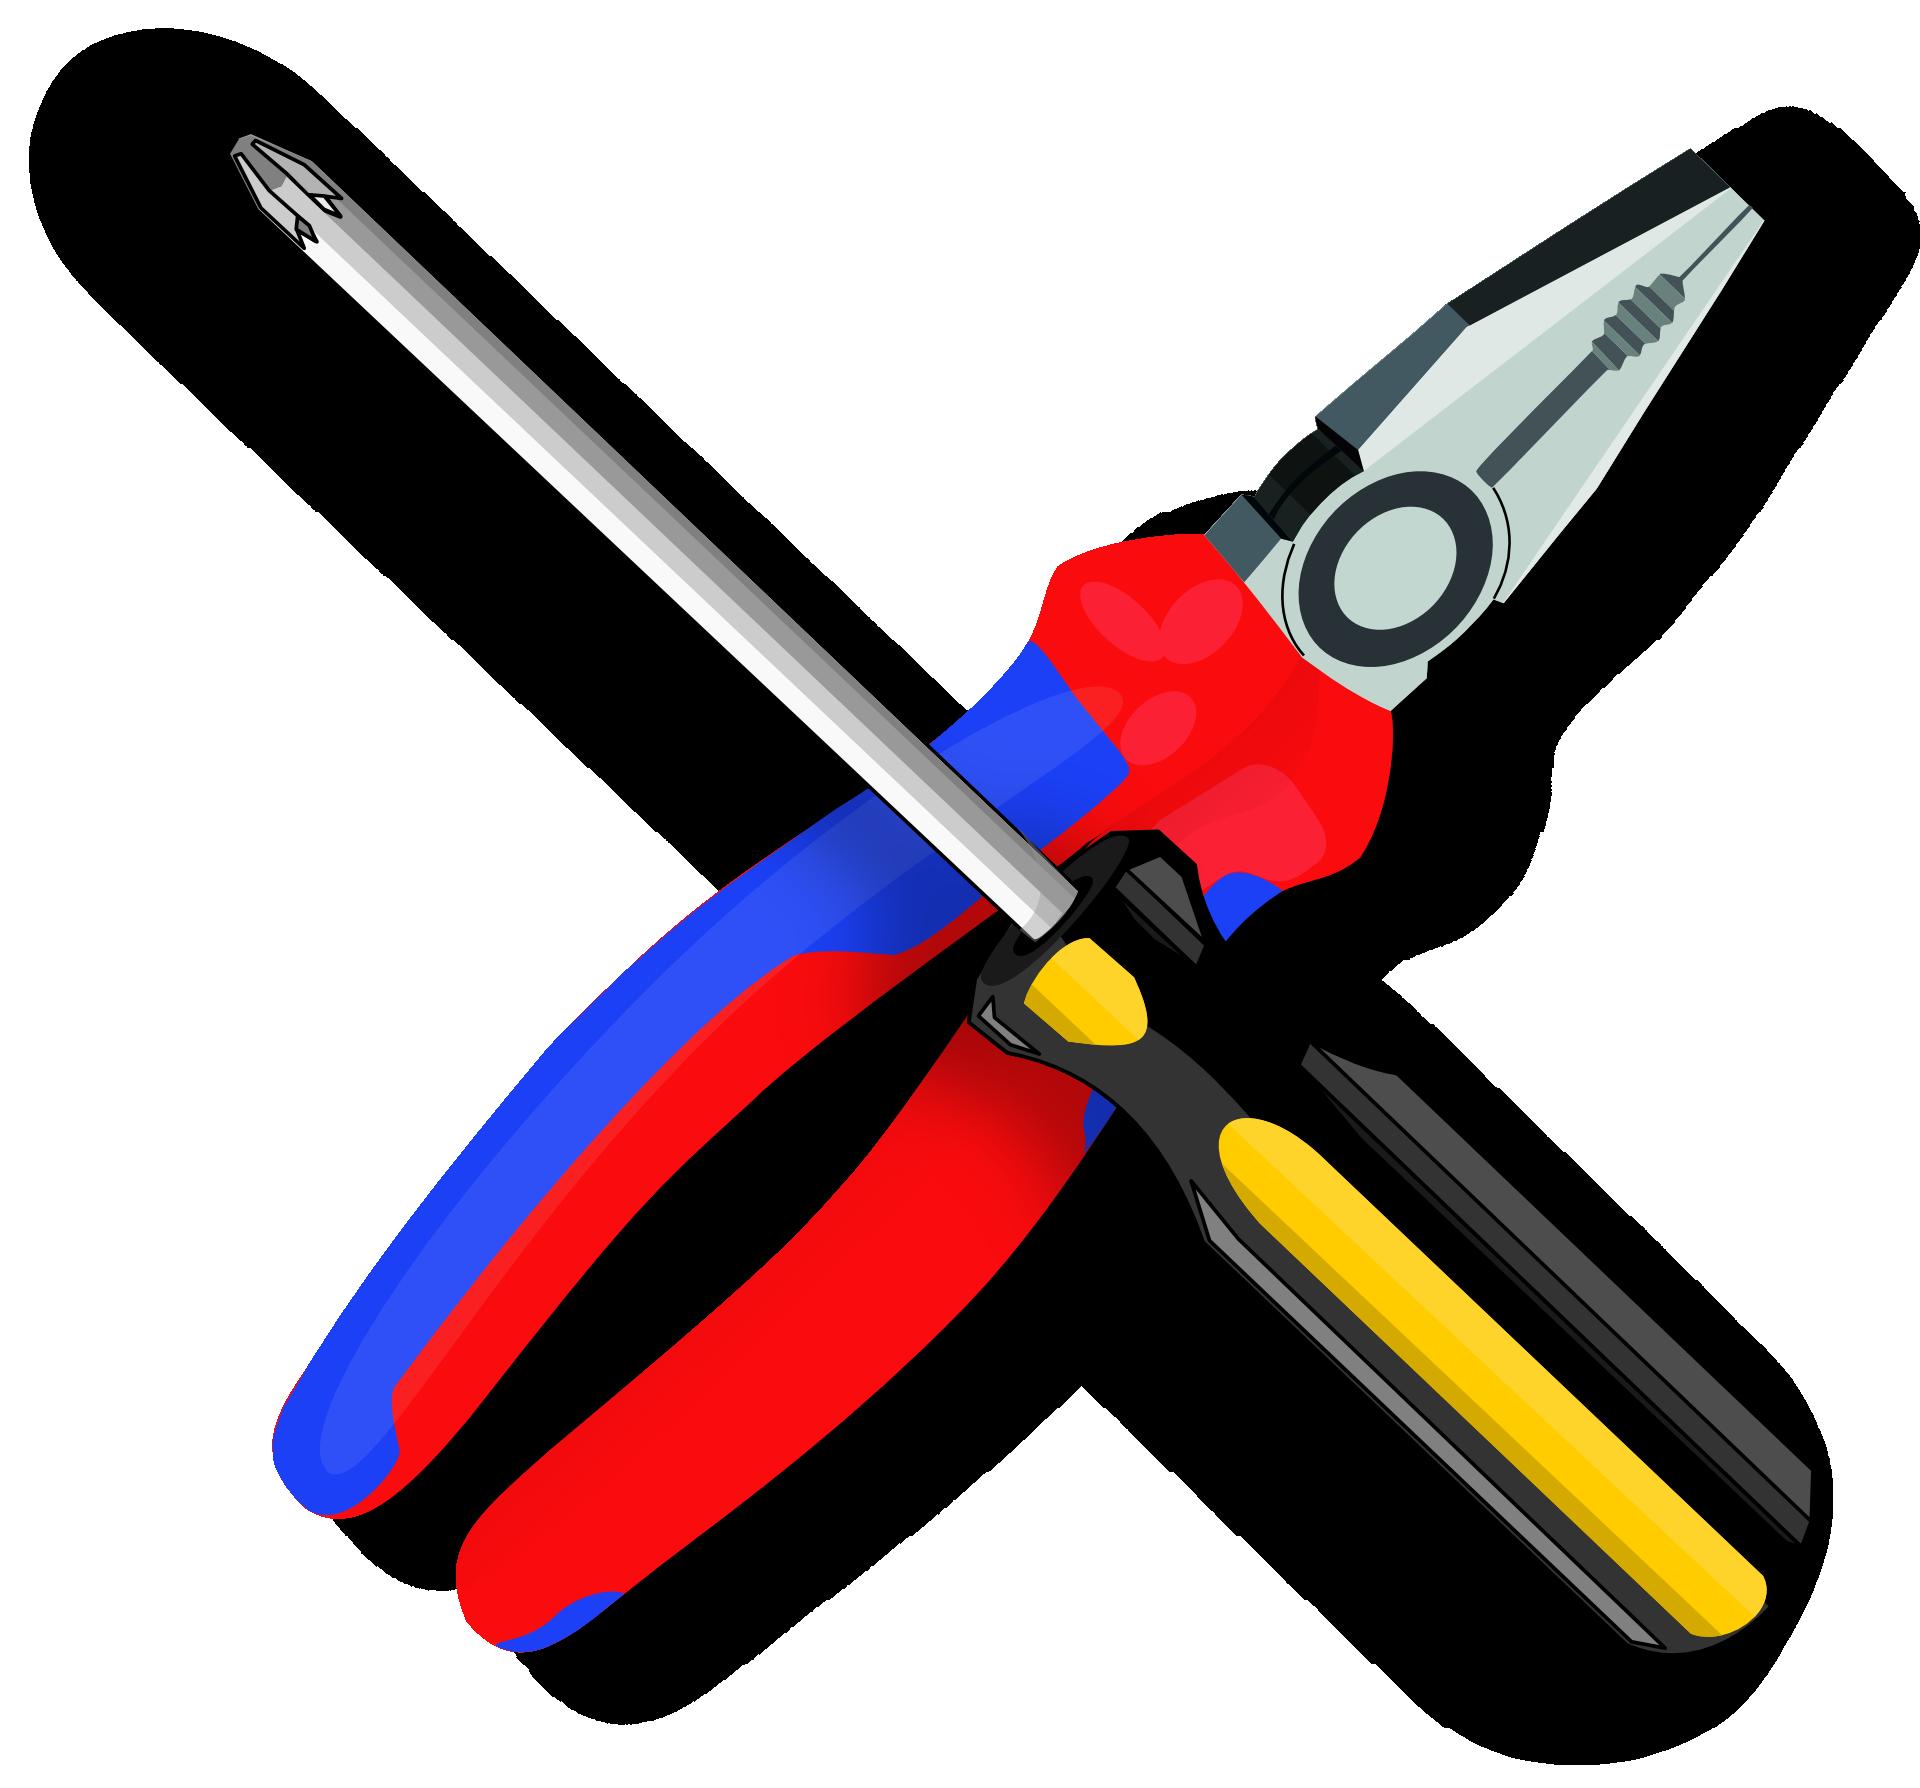 Tool clipart handy man. Handyman faq pros california